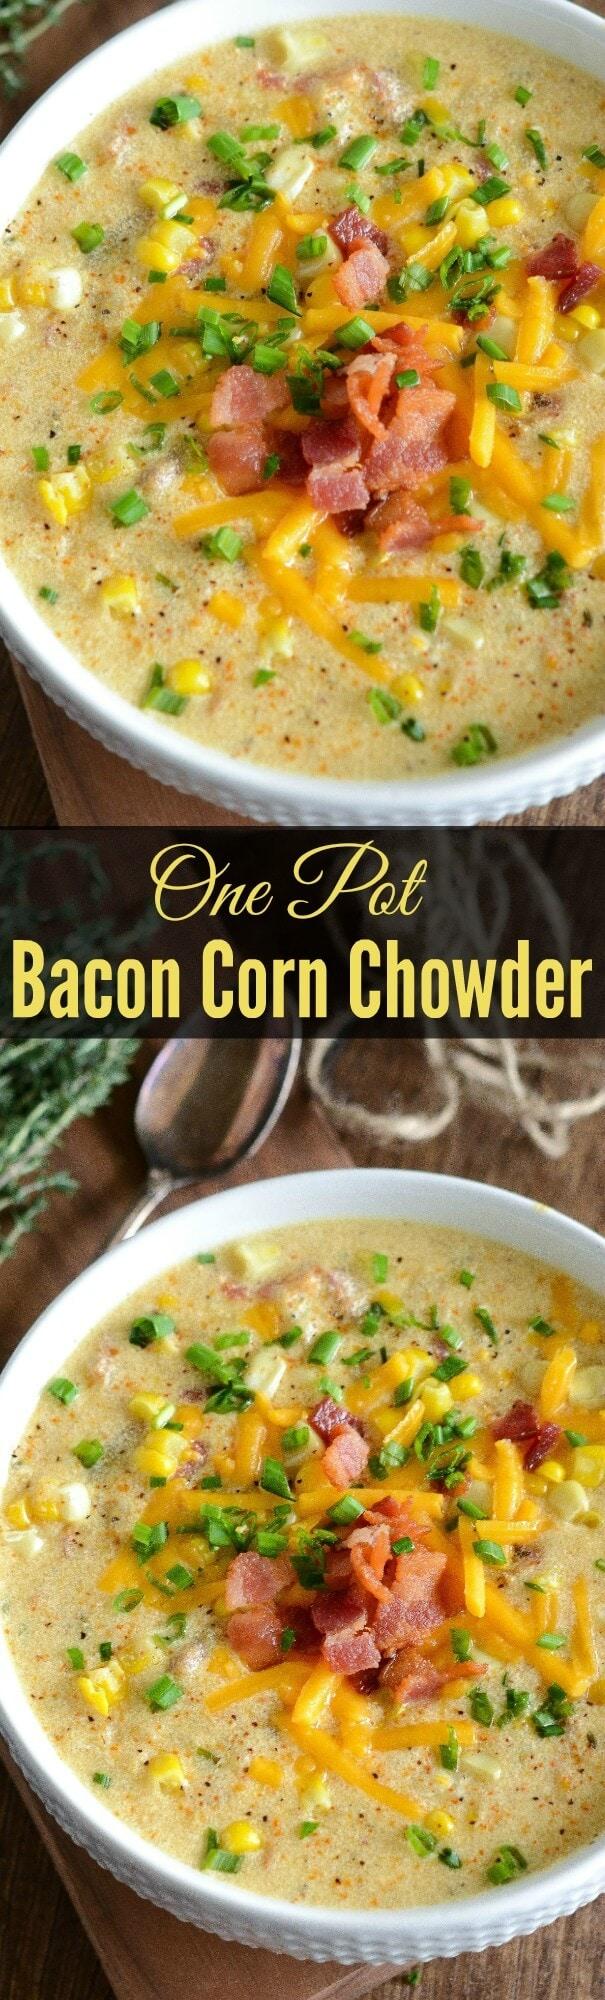 One Pot Bacon Corn Chowder!